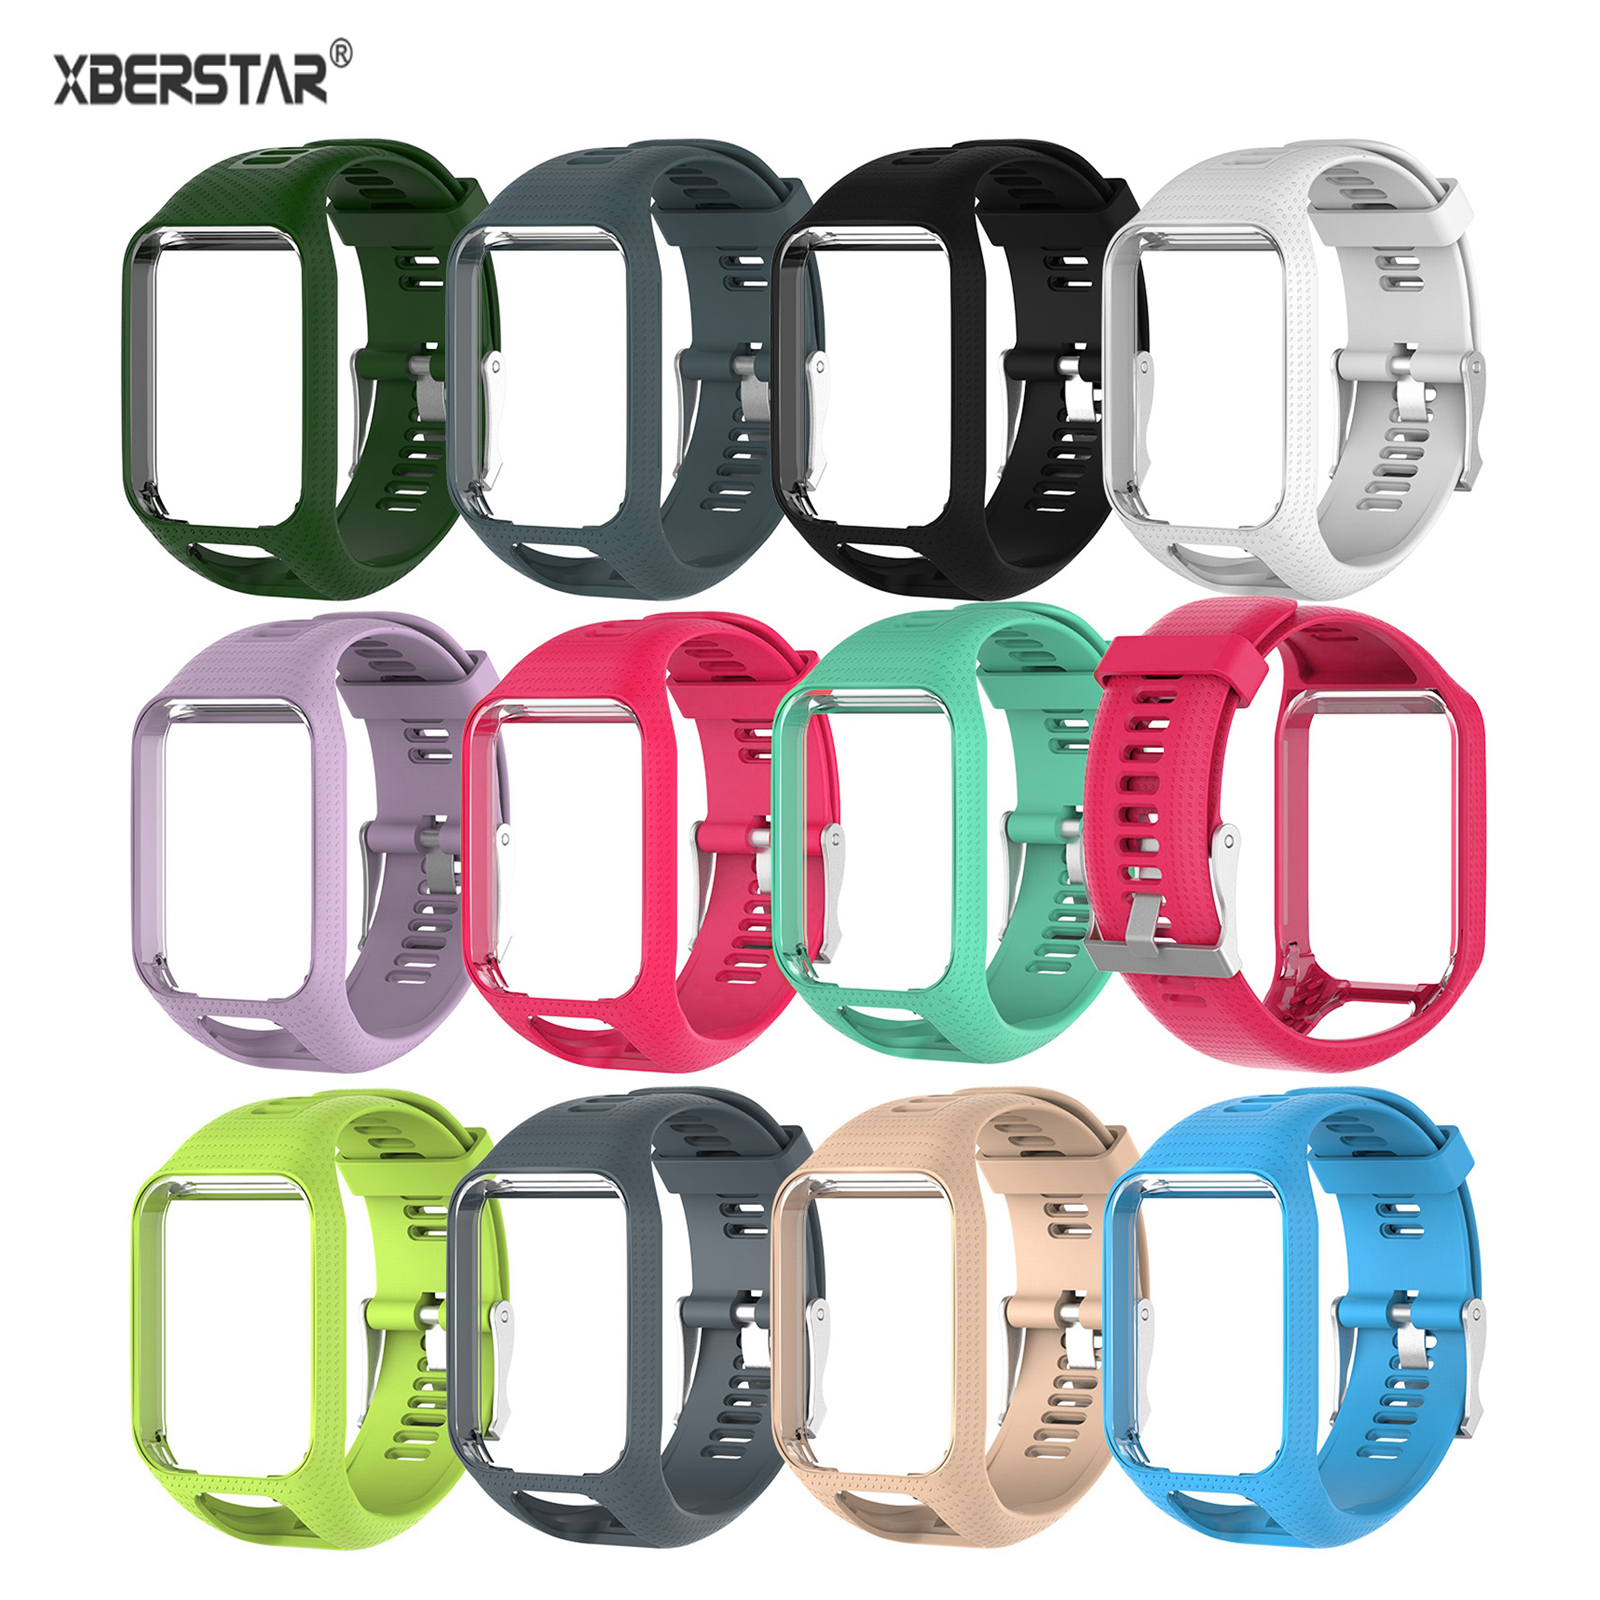 XBERSTAR Replacement Band for TomTom Runner 2 3 Watchband Strap for TomTom Spark Golfer Adventurer Spark 3 GPS Watch TPE